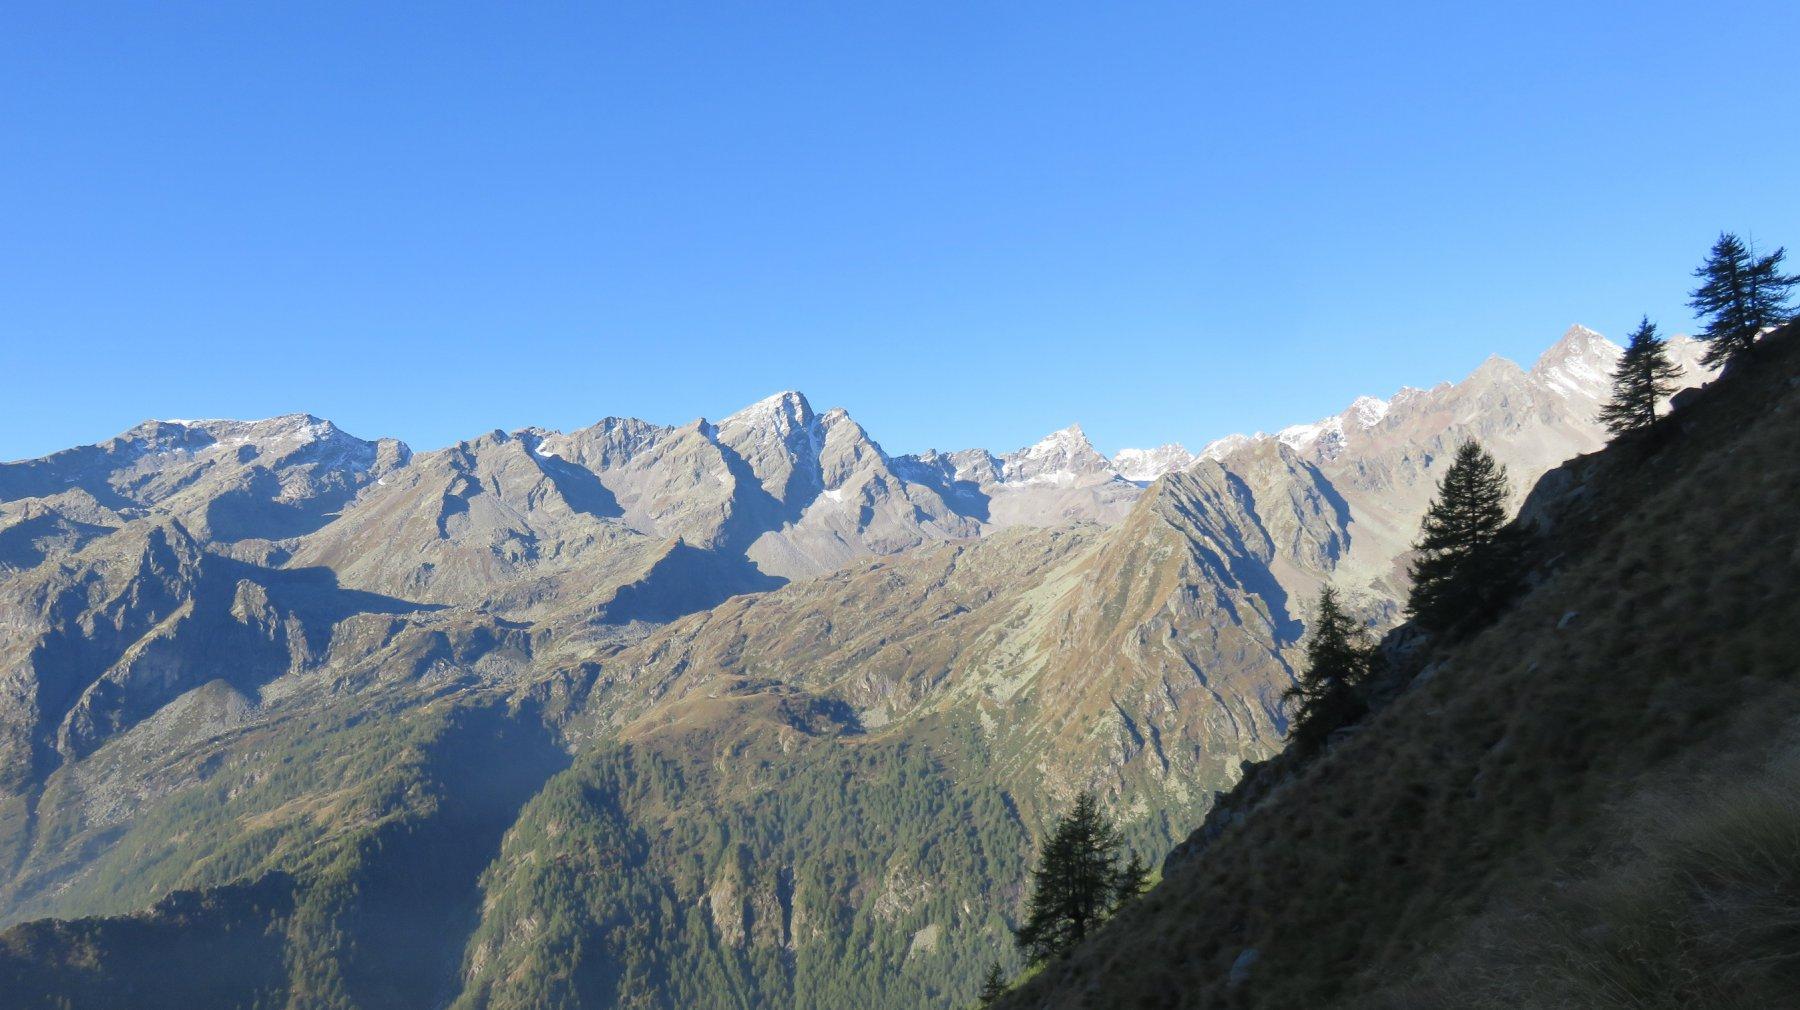 Panorama dai ripidi pendii erbosi sopra Peghiò